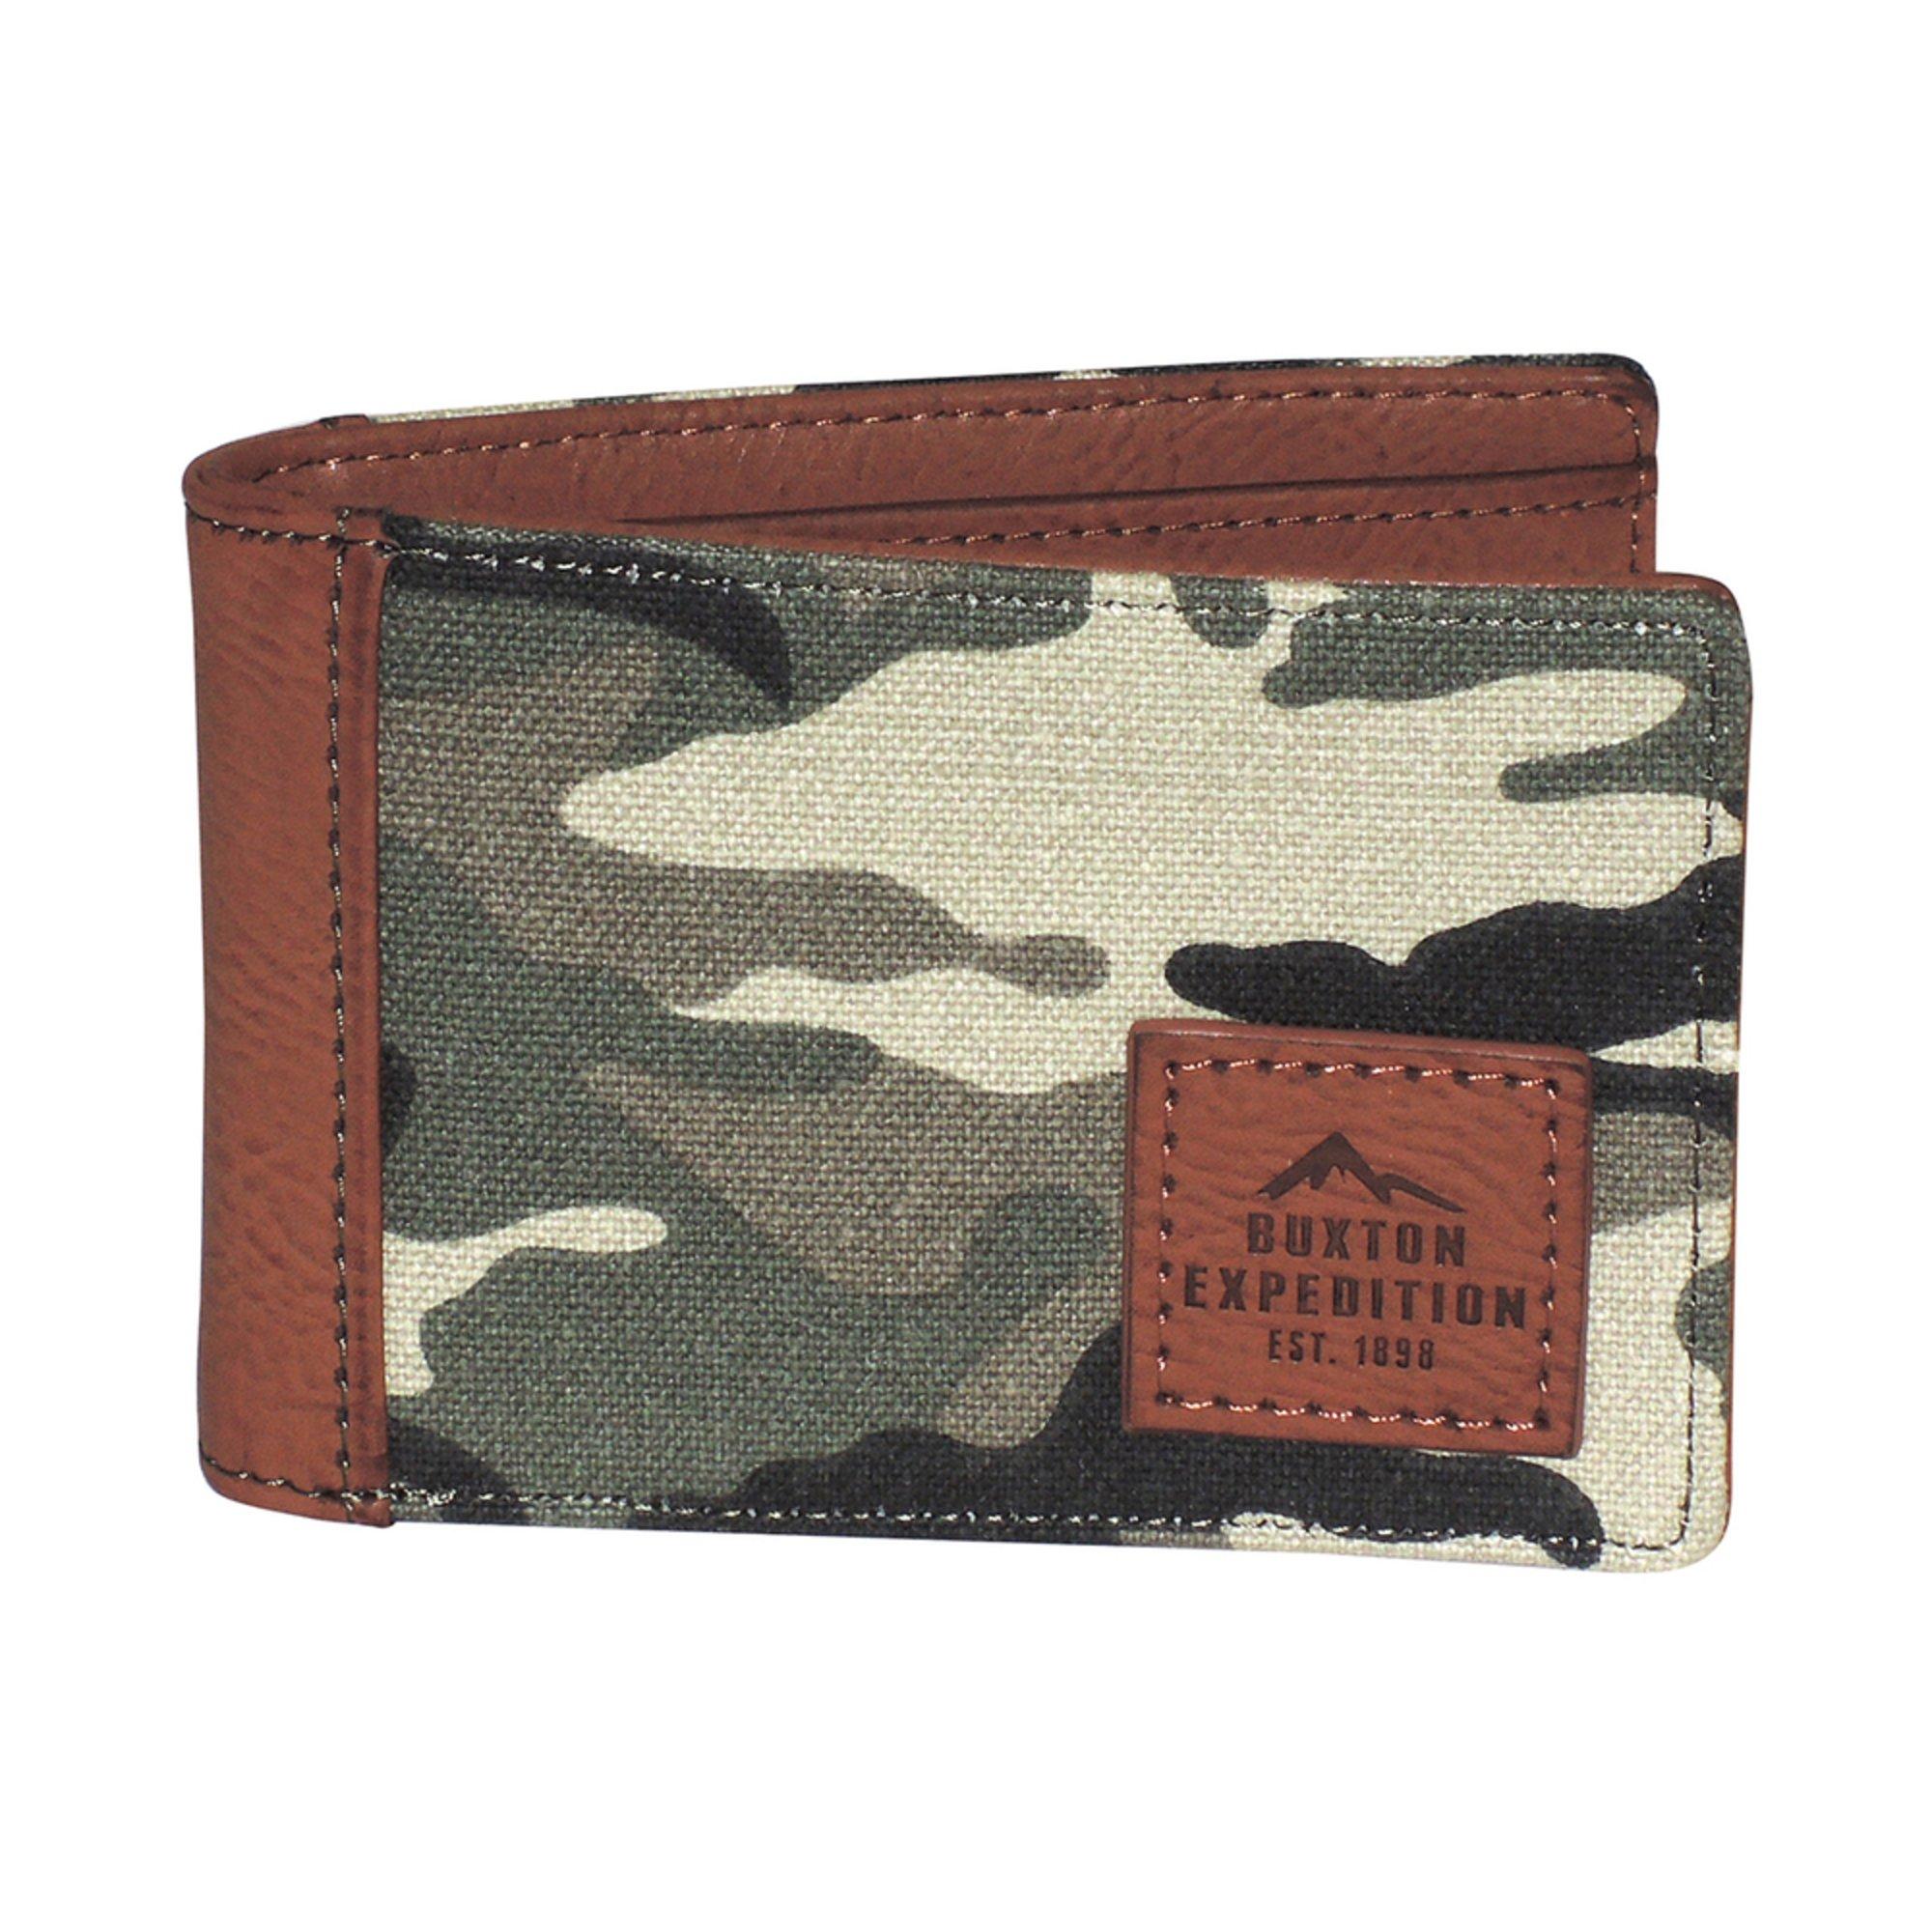 Buxton Expedition Huntington Gear Front Pocket Slimfold ...